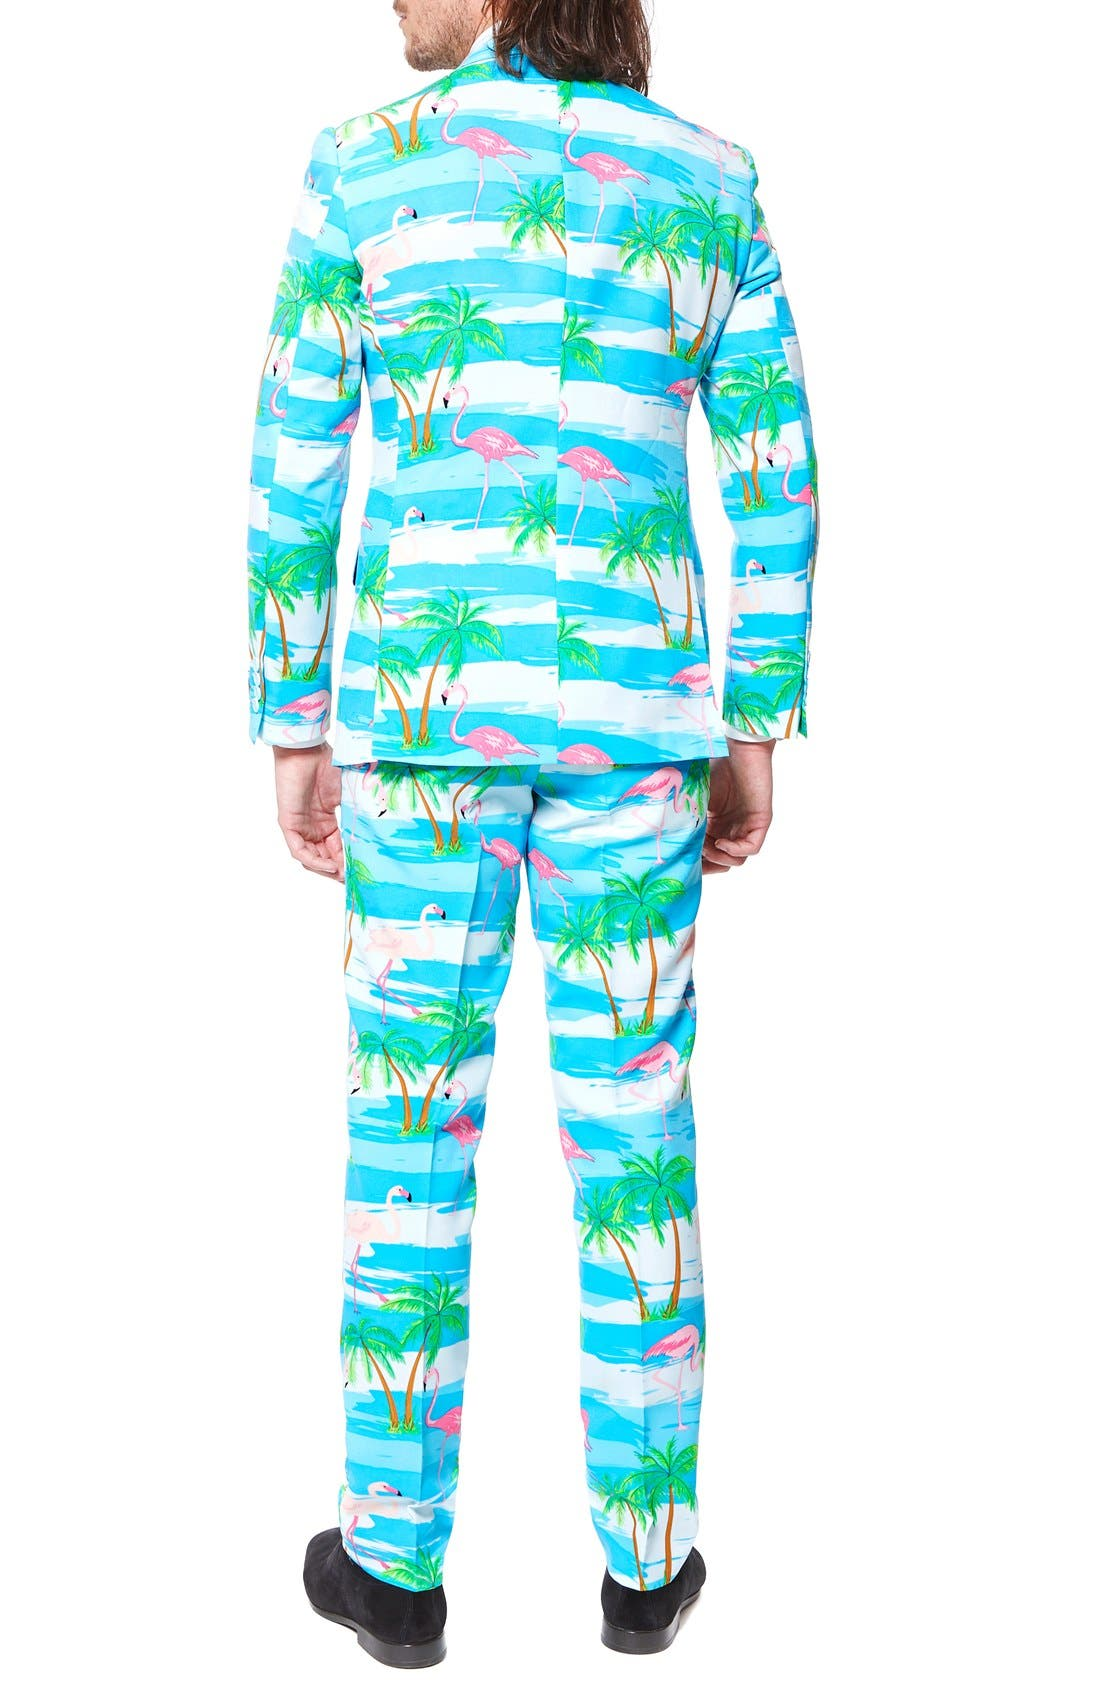 'Flaminguy' Trim Fit Two-Piece Suit with Tie,                             Alternate thumbnail 6, color,                             400